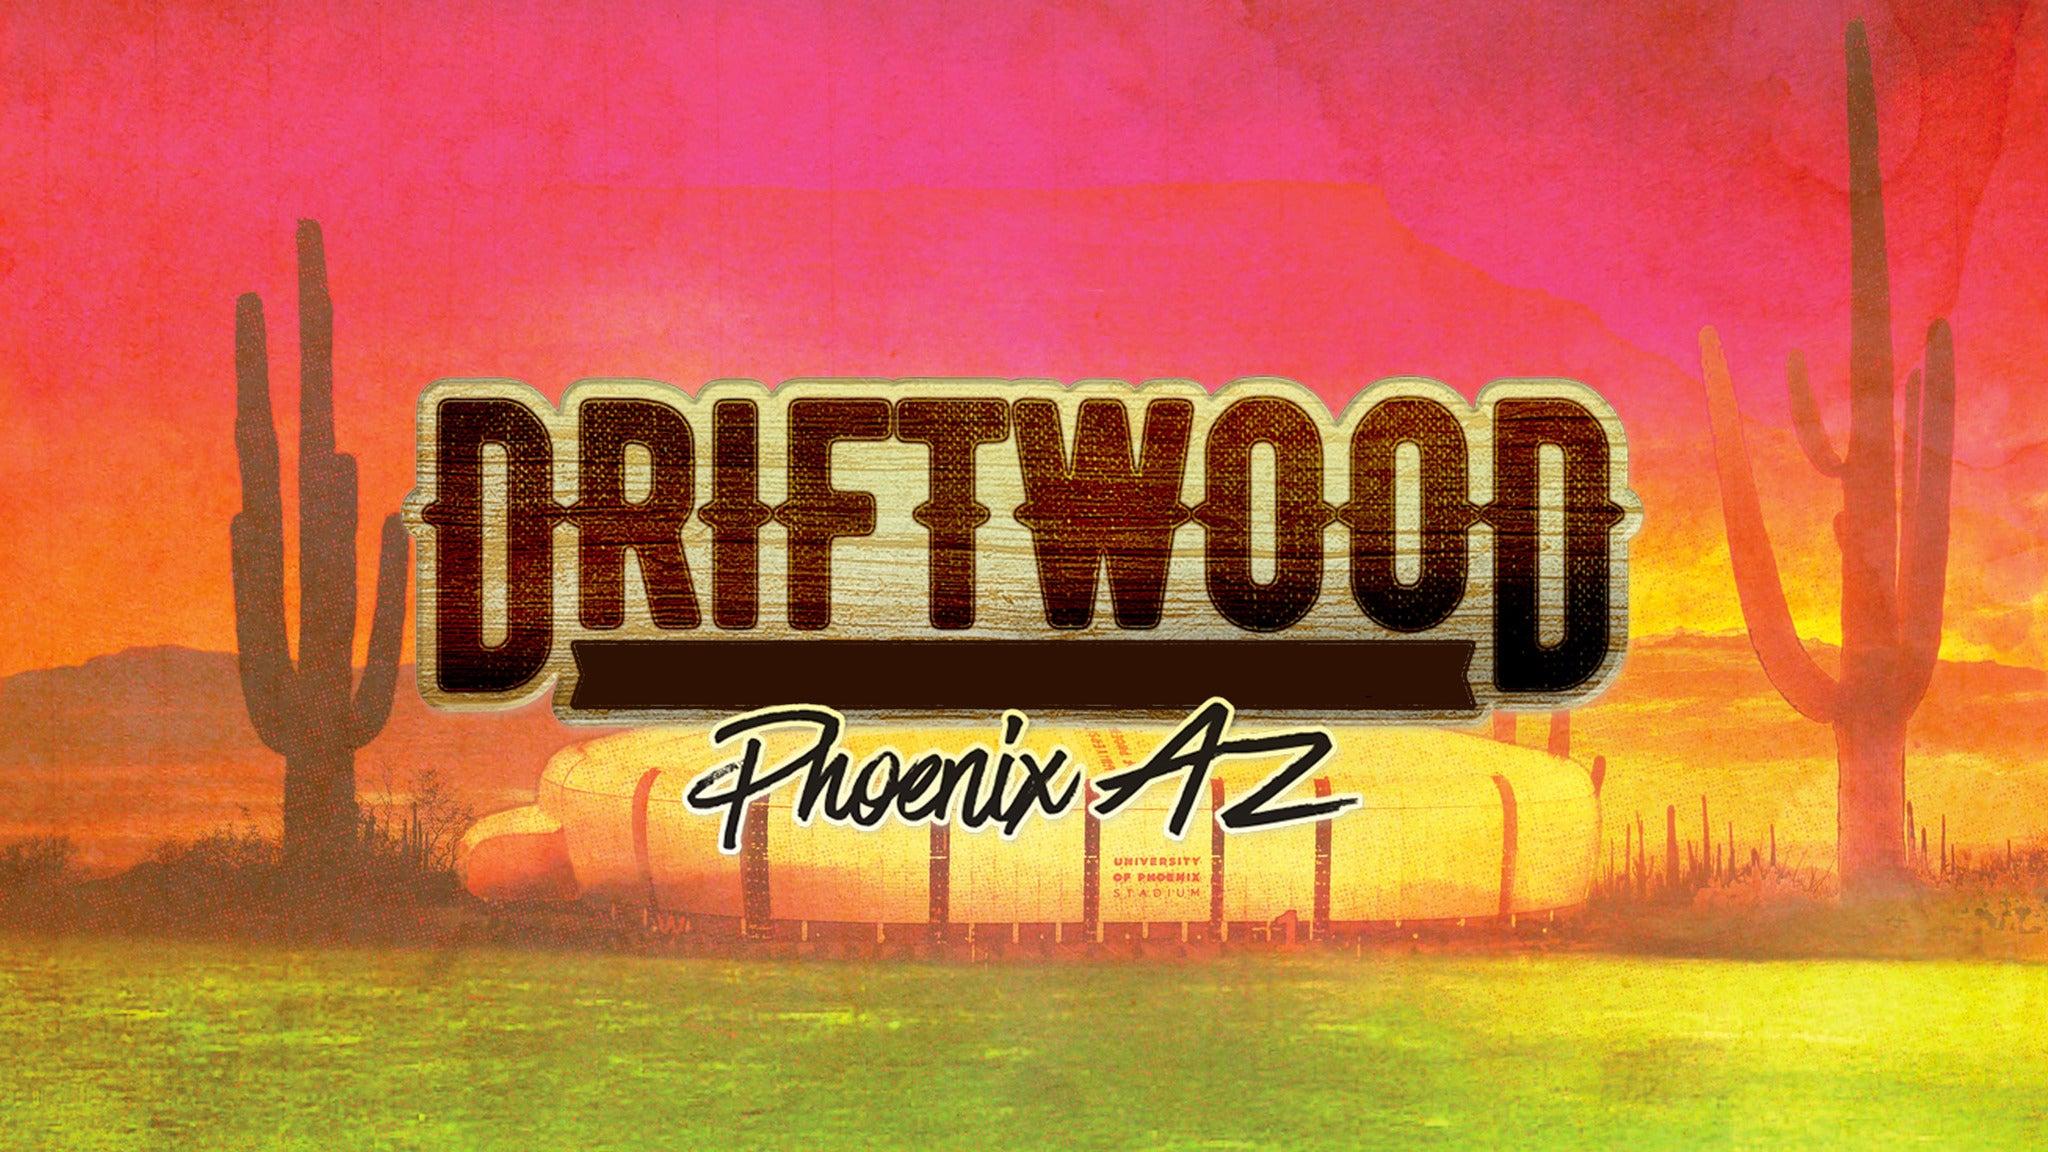 Driftwood Phoenix at University of Phoenix Stadium